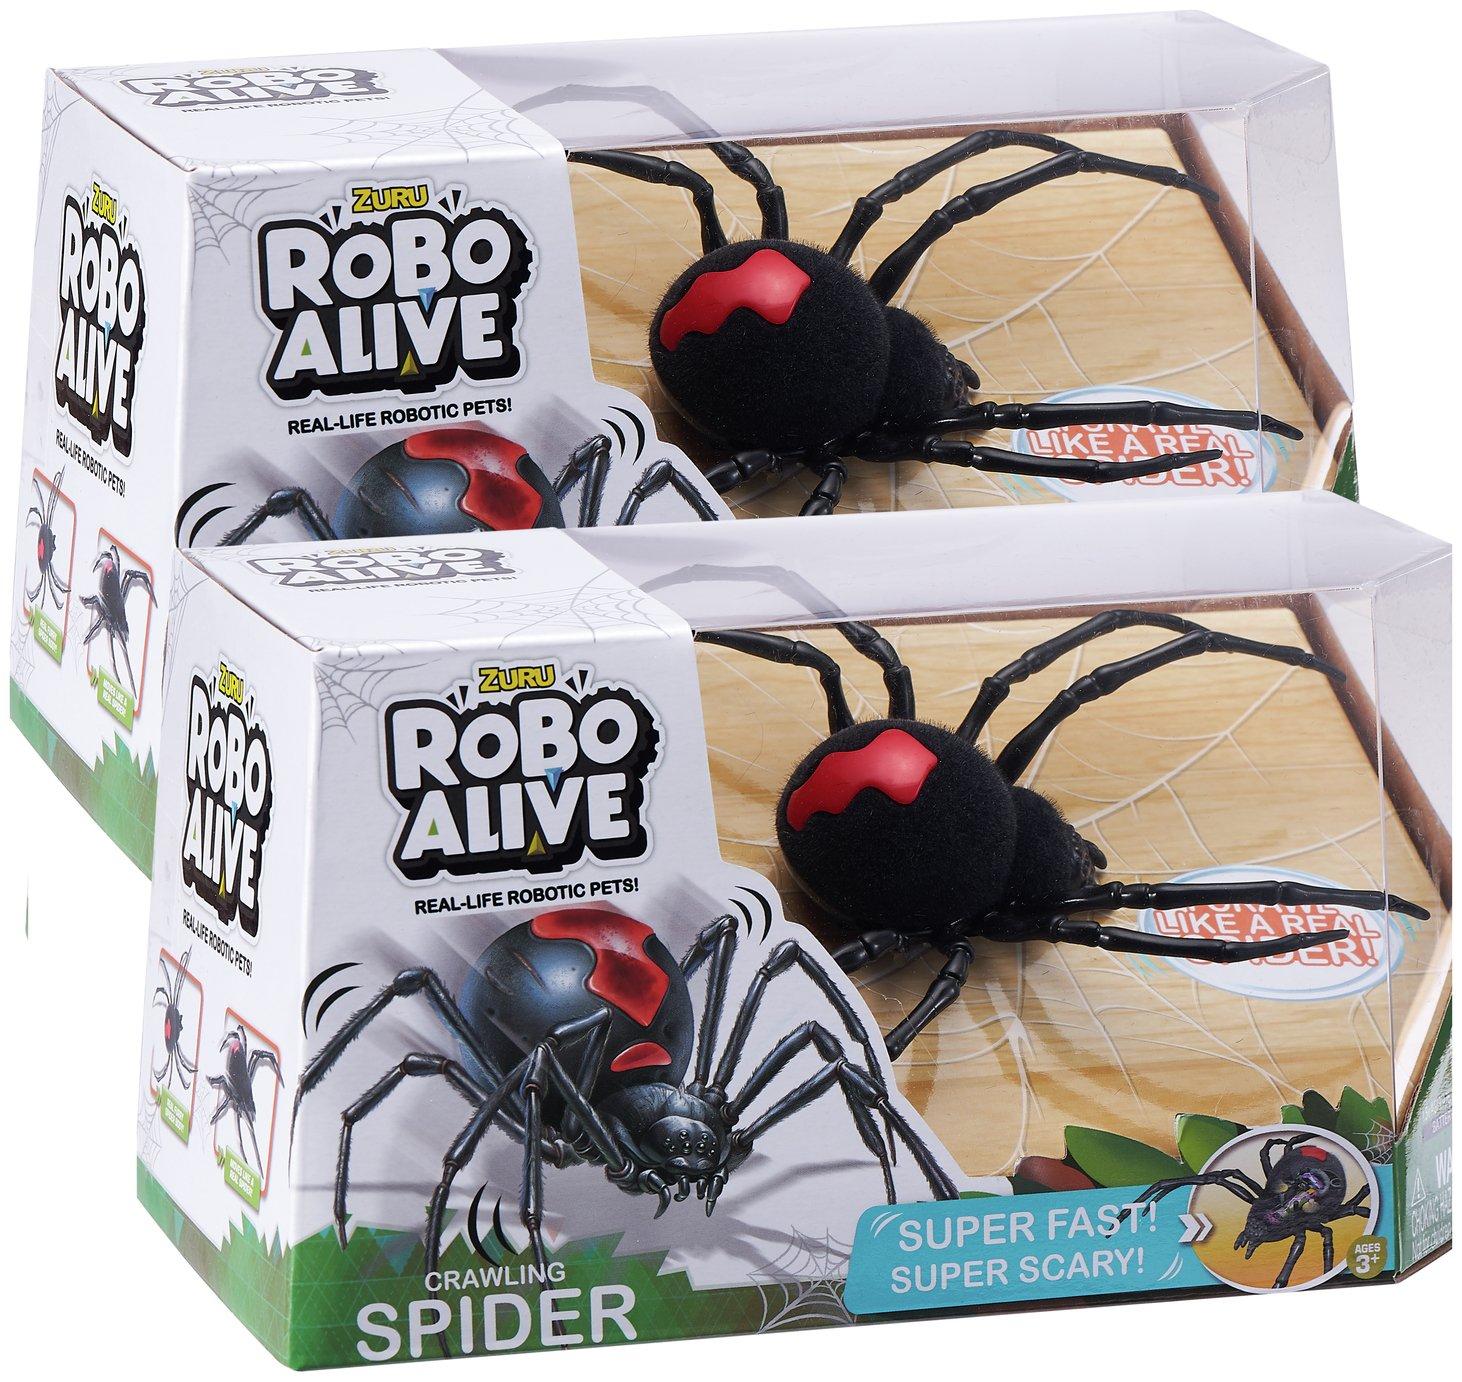 Zuru Robo Alive Crawling Spider Twin Pack (To terrify someone special) £4.99 @ Argos